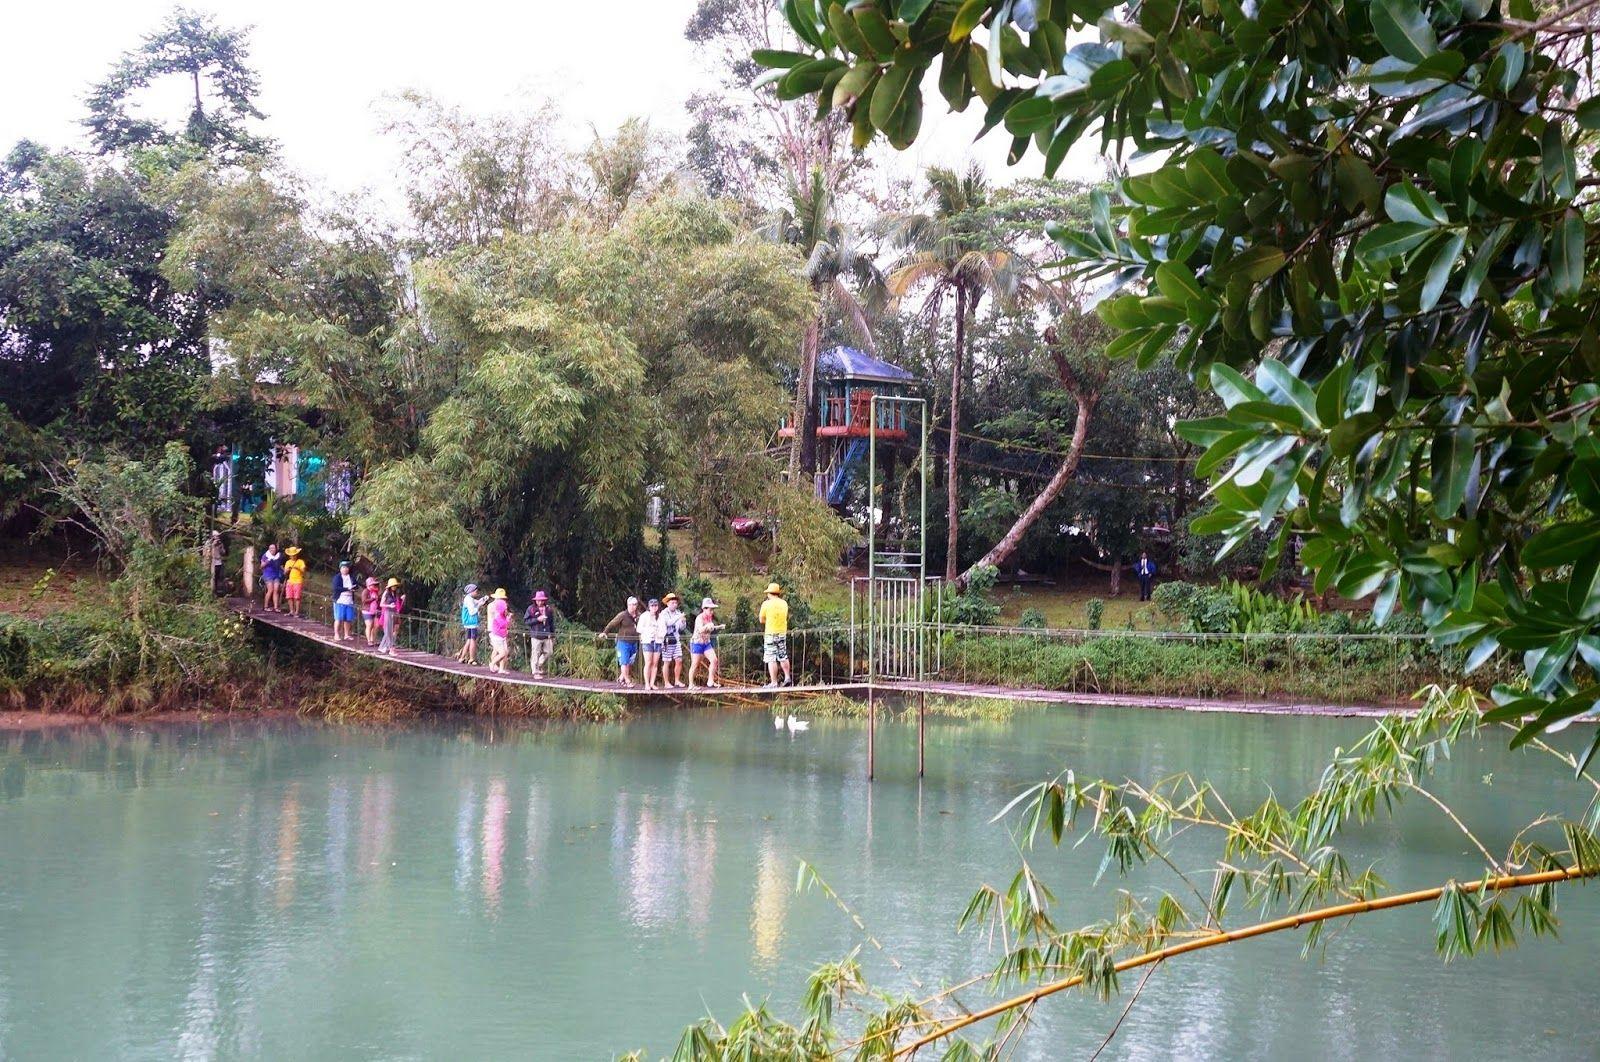 #CavEAT: Cavinti Eco-Adventure Tour (First Day Wrap Up) ~ Wazzup Pilipinas